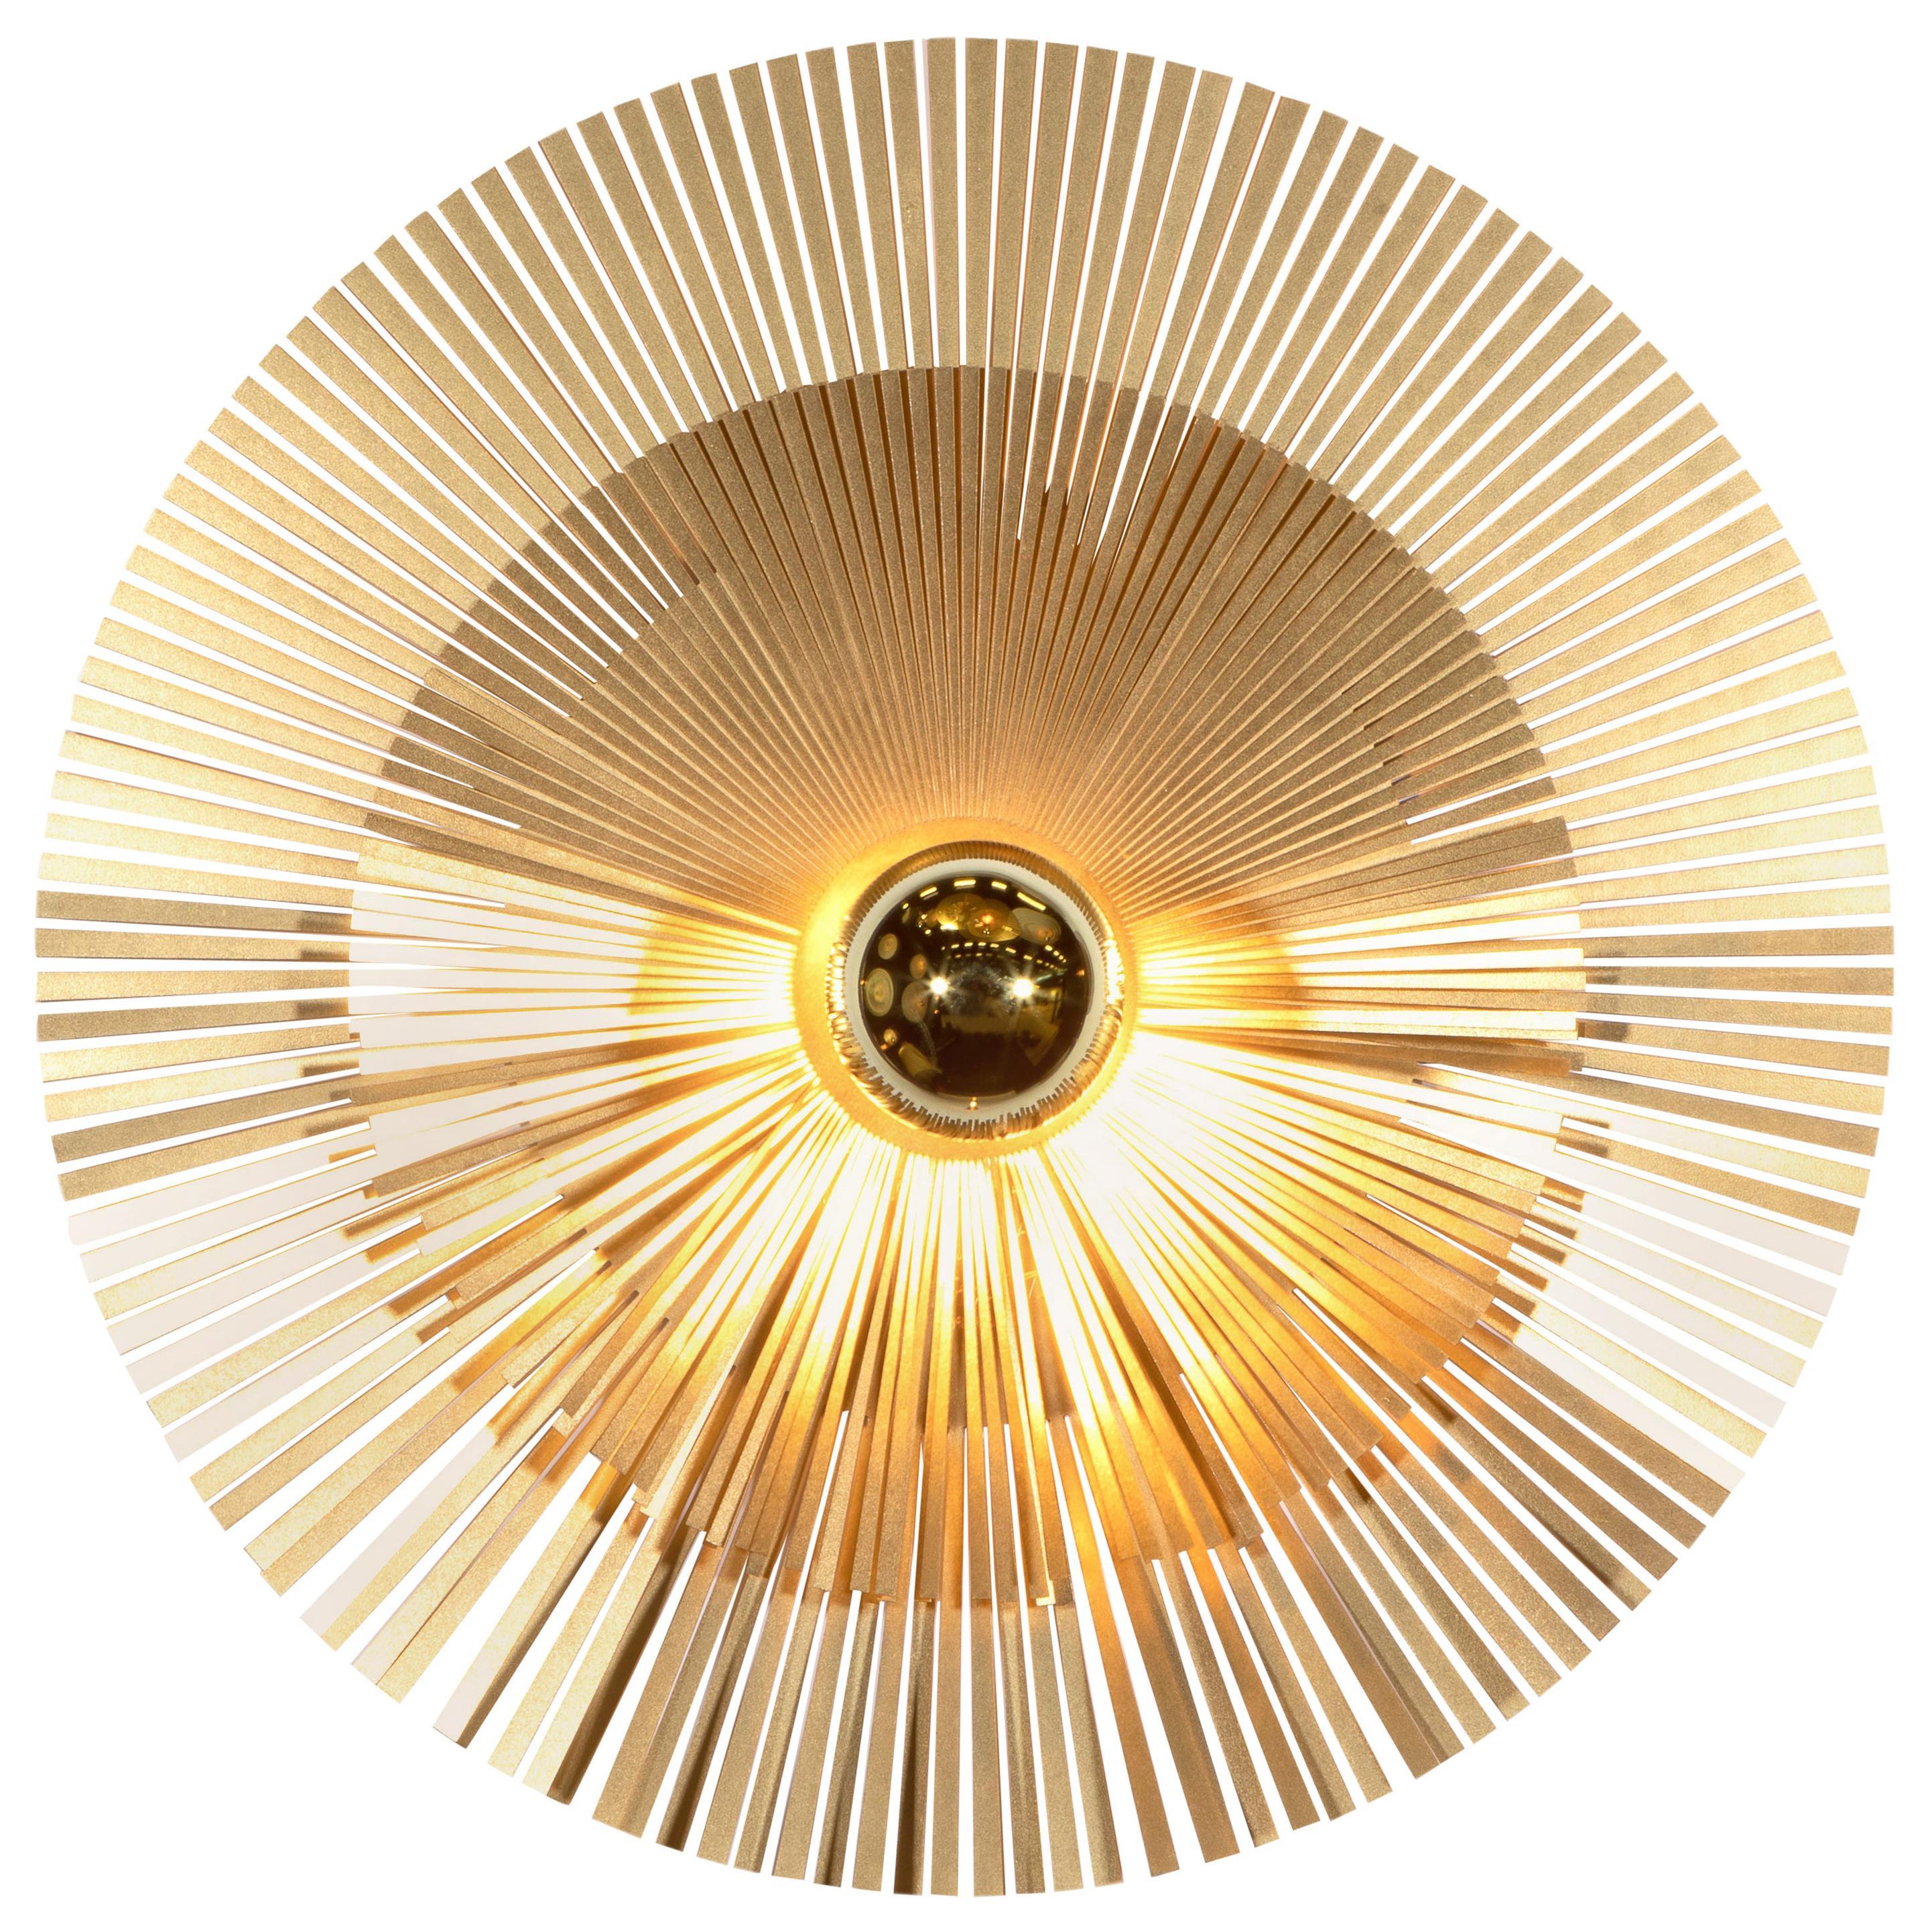 Contemporary Lafaiette S Wall Light Sconce Lamp Abstract Sculptures Brass Radar